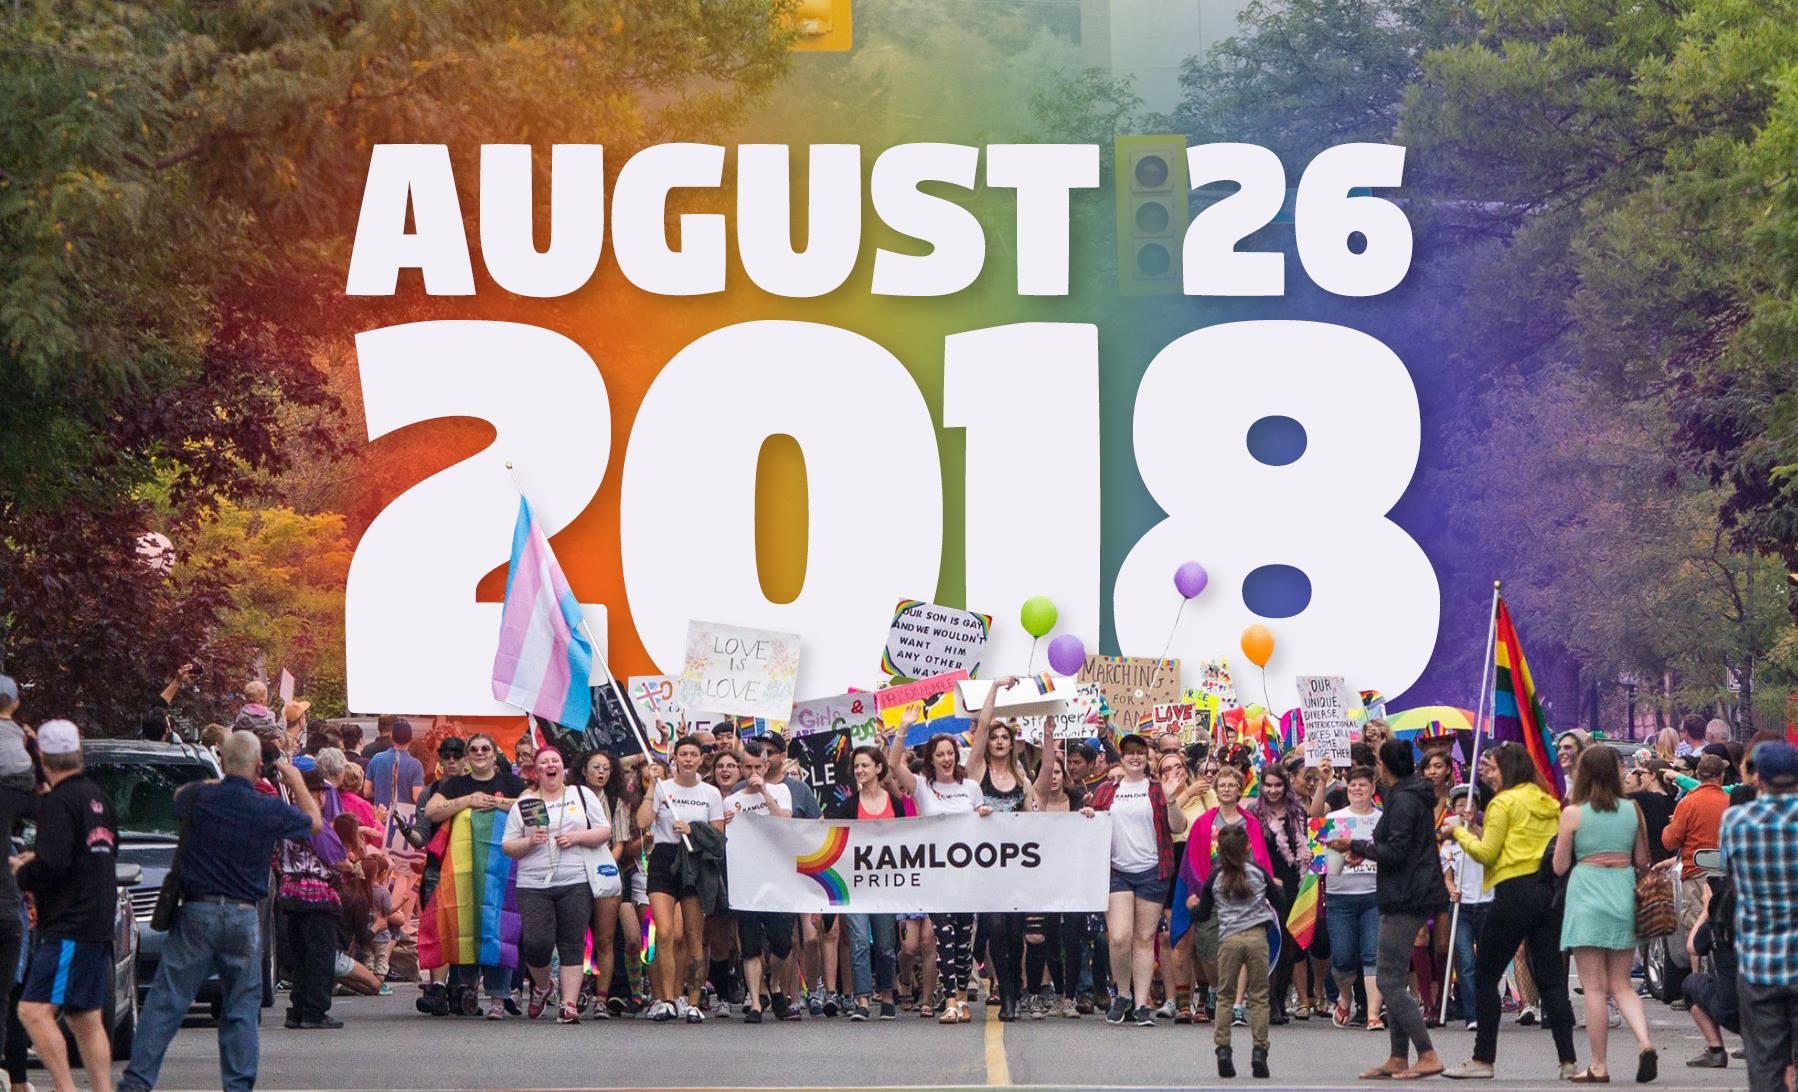 Help wanted- Kamloops Pride Parade organizers hoping for performers